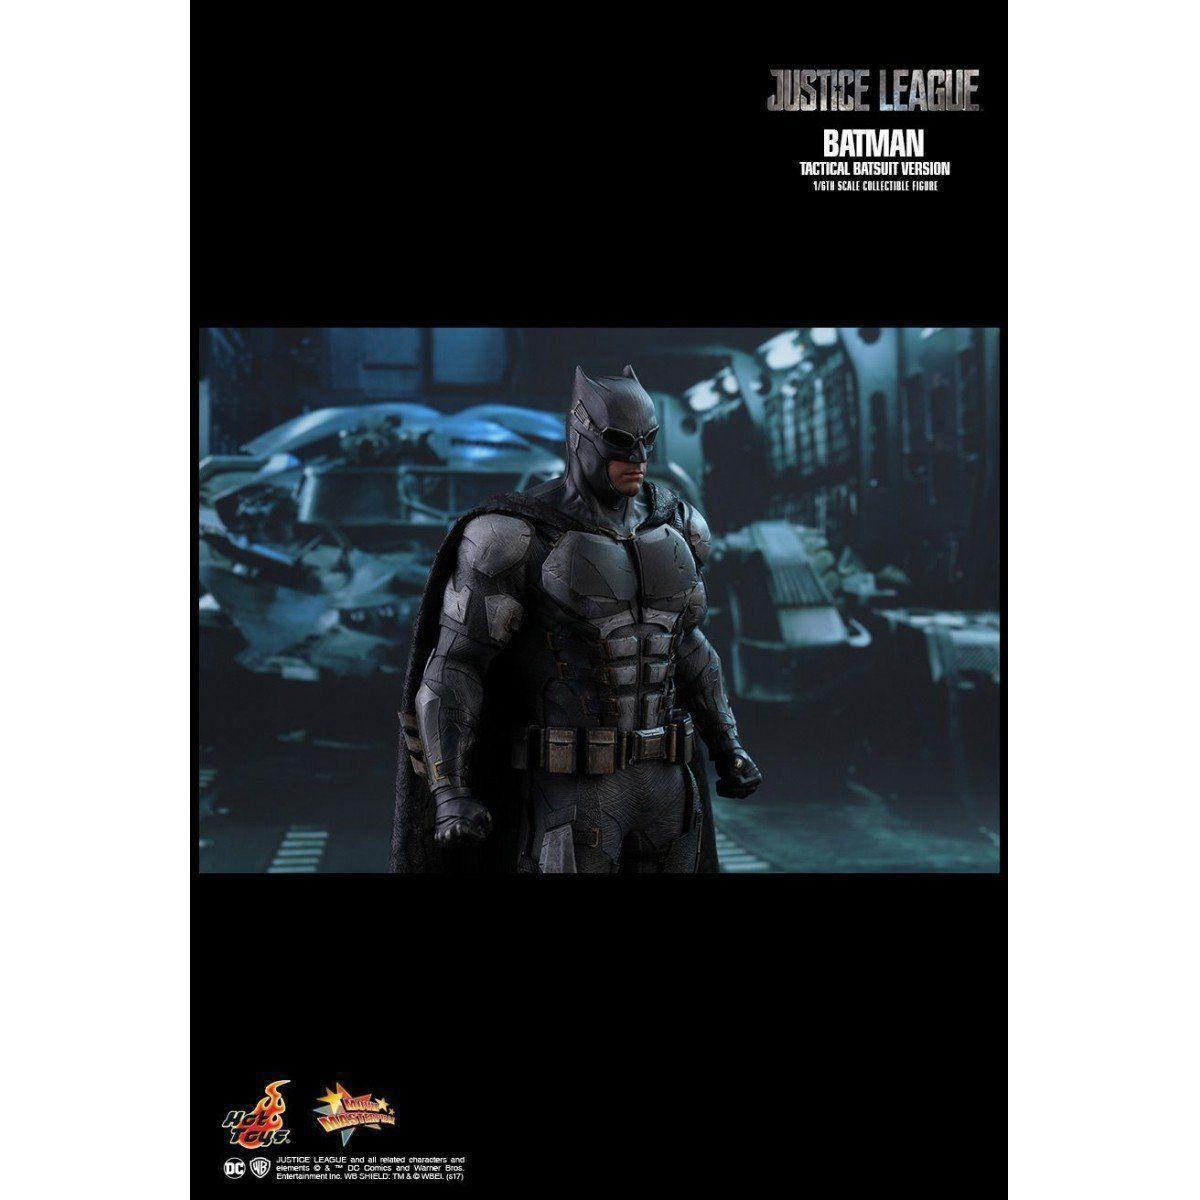 Boneco Batman Uniforme Tático (Tactical Batsuit): Liga da Justiça (Justice League) Escala 1/6 - Hot Toys (Apenas Venda Online)